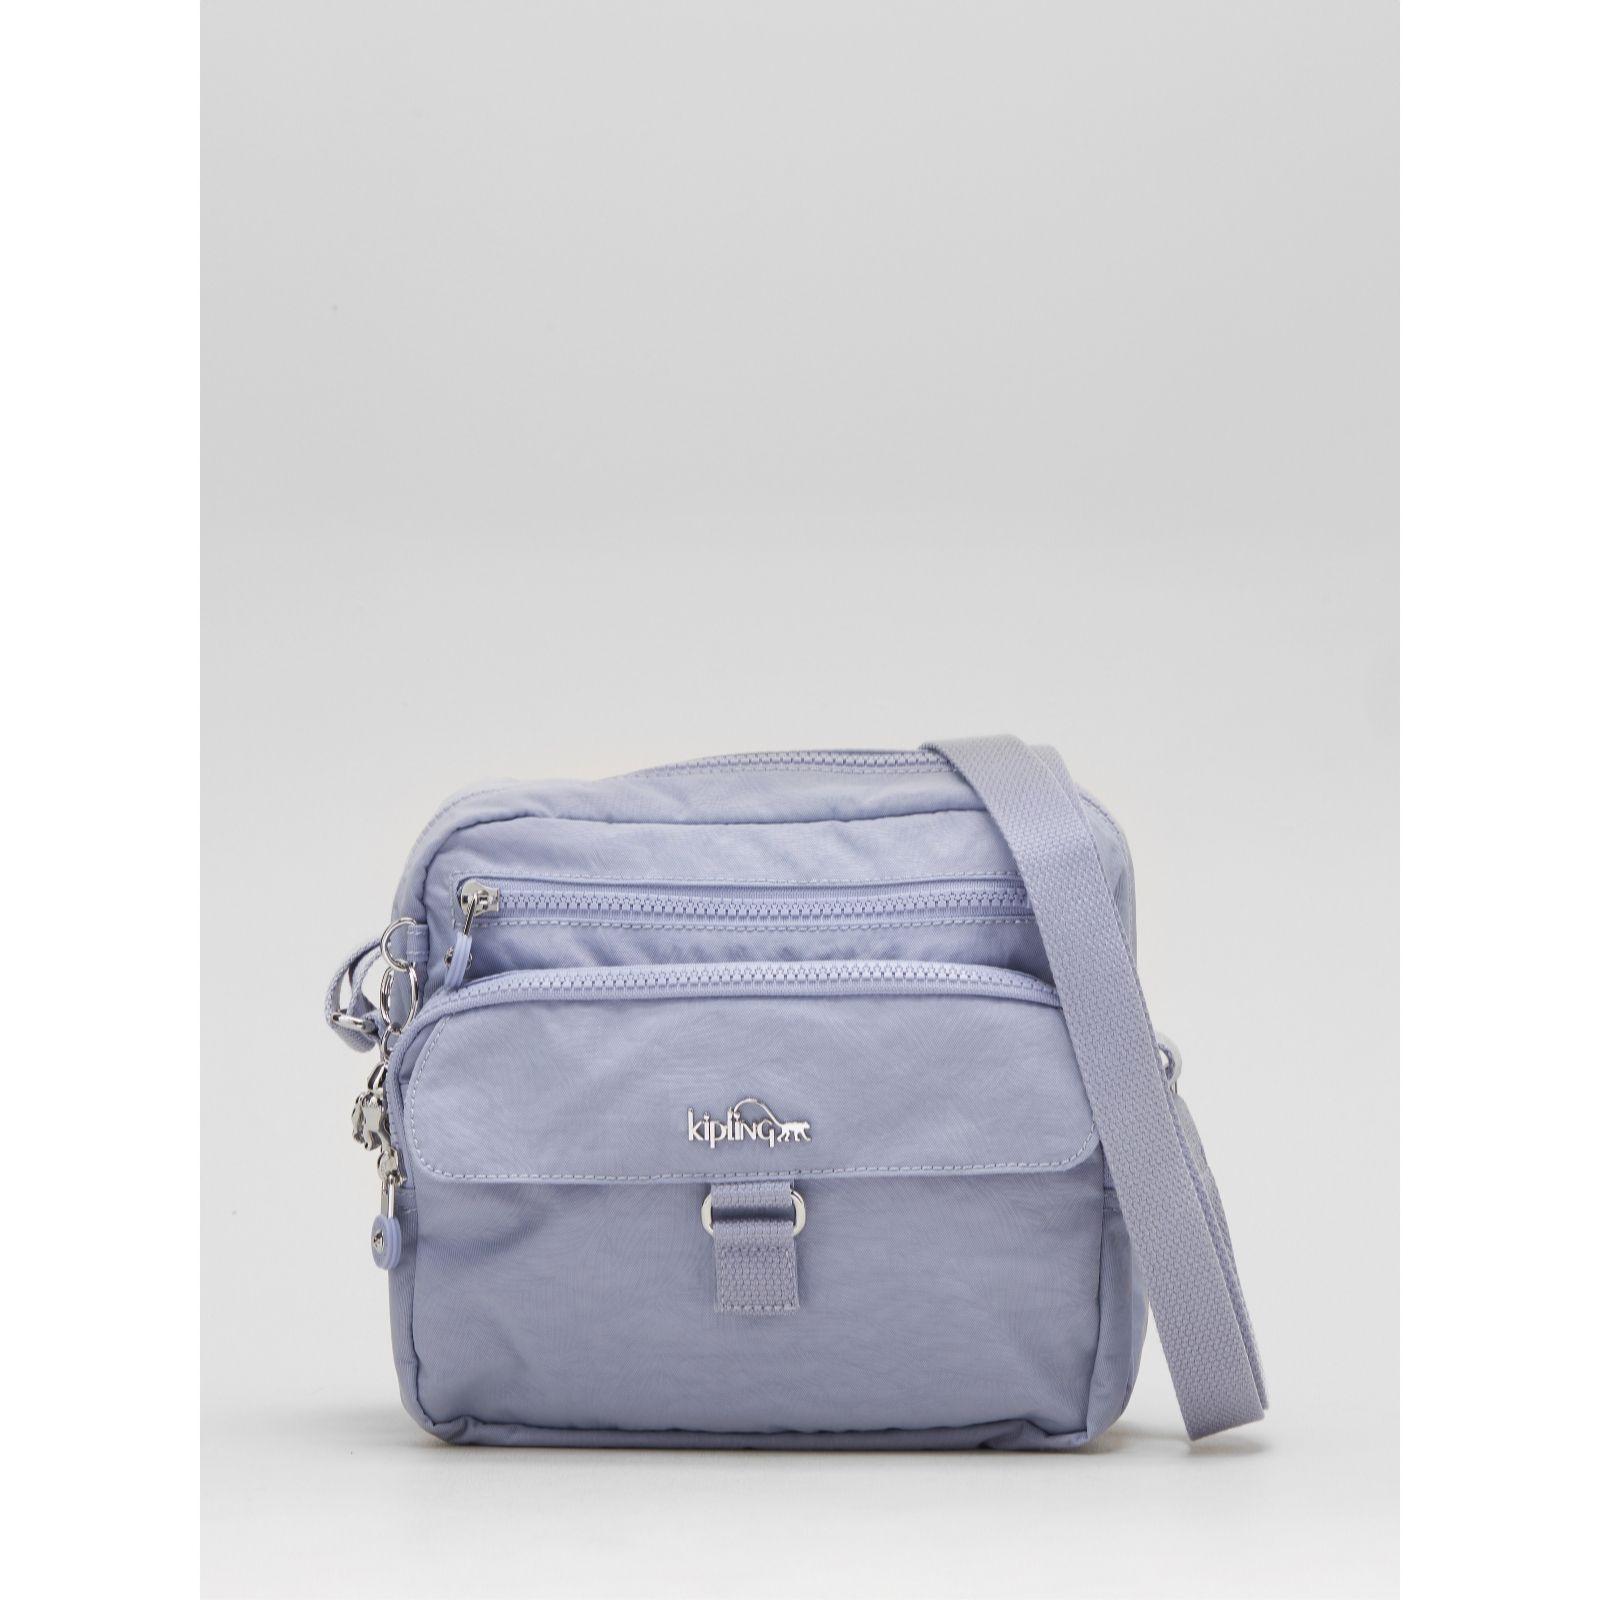 b7acf98e4 Kipling Donover Premium Medium Zip Top Crossbody Bag - Page 1 - QVC UK